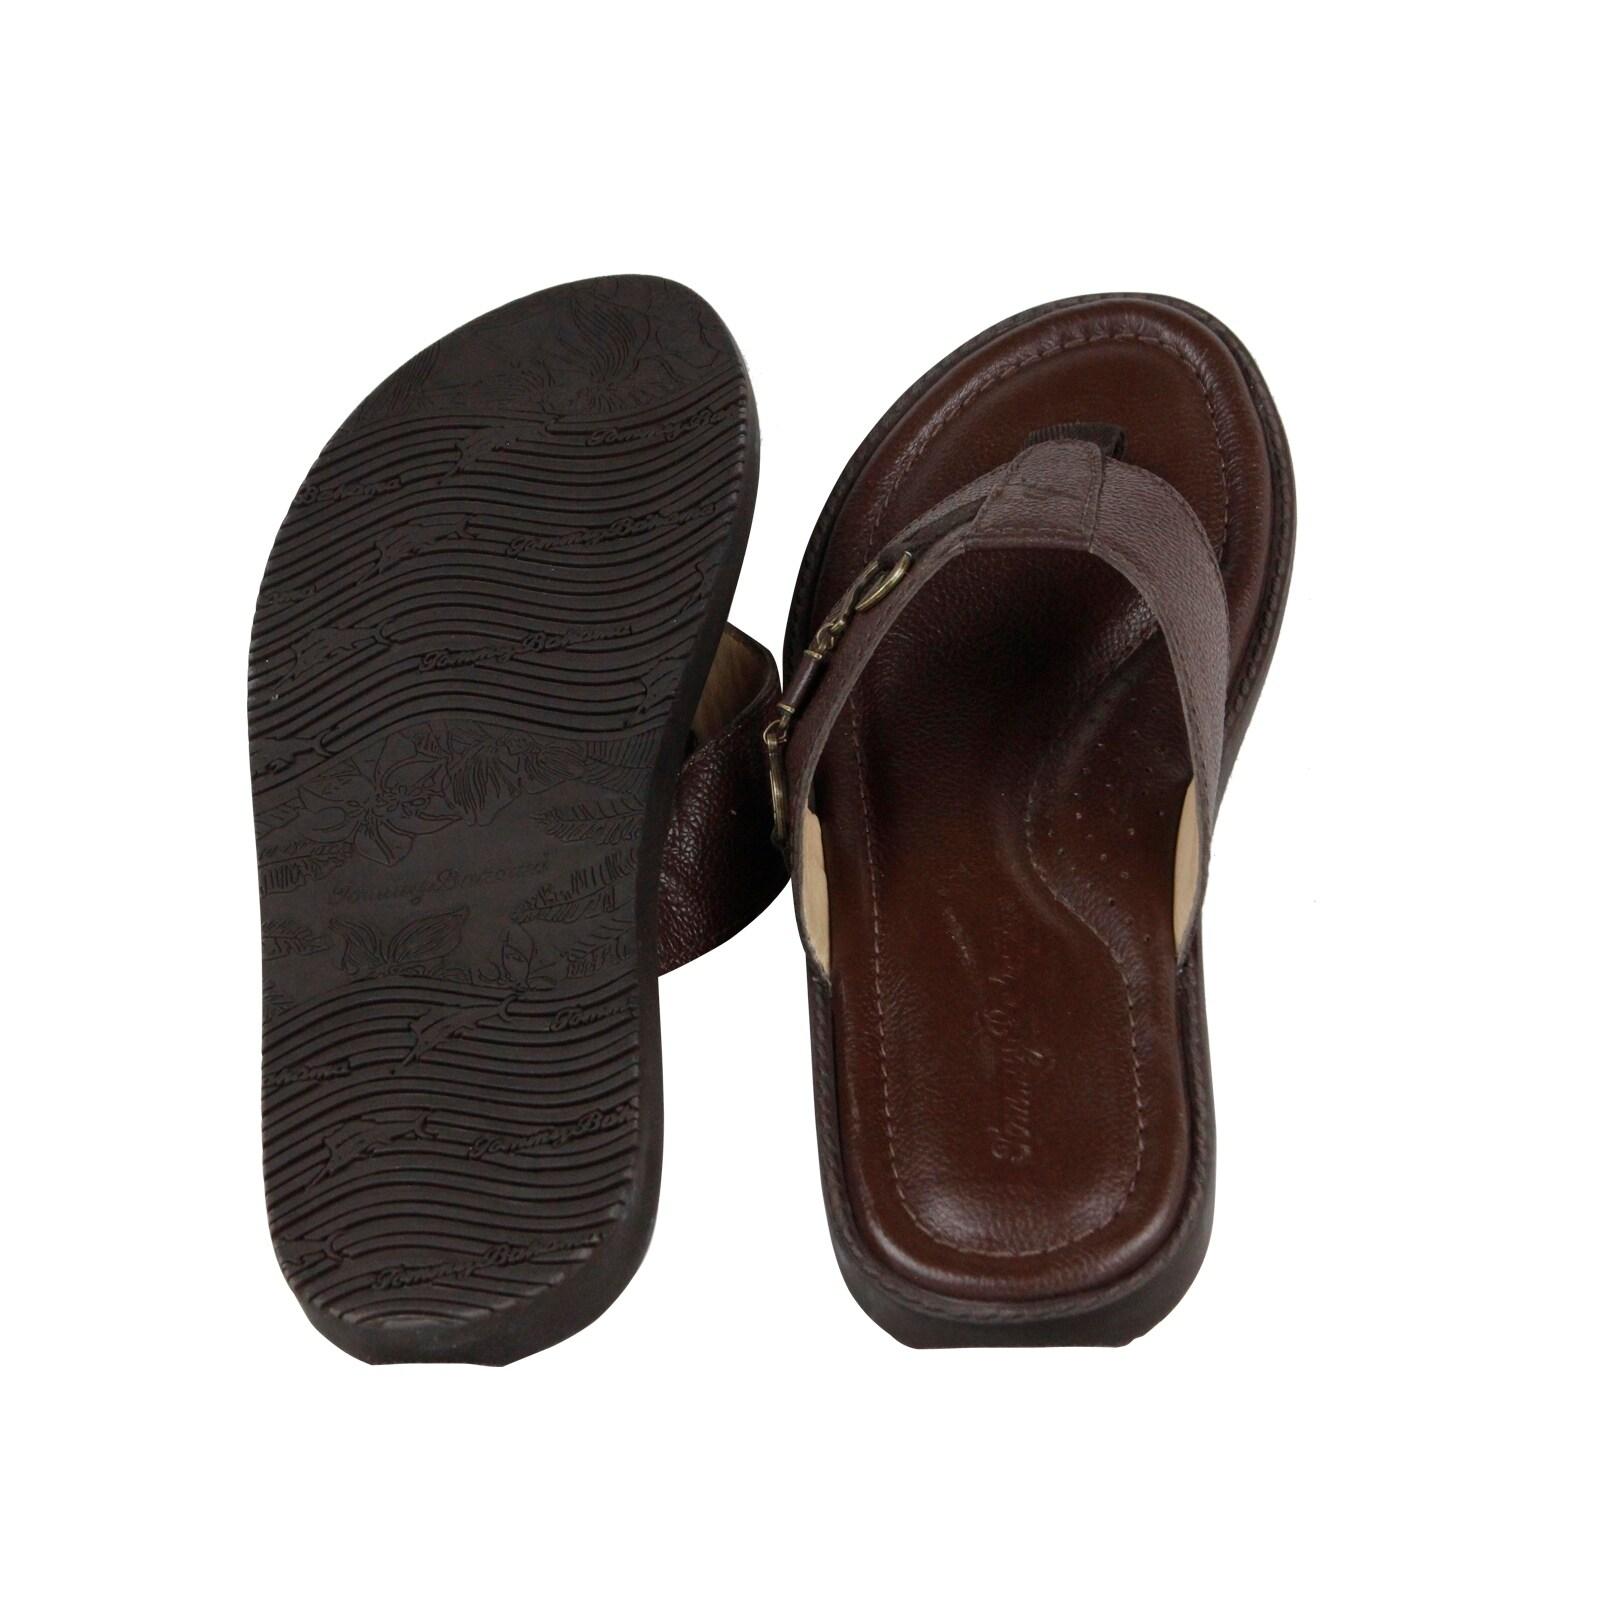 f3fb303504ee1 Shop Tommy Bahama Belize Vintage Mens Brown Leather Flip Flops Sandals Shoes  - Free Shipping Today - Overstock - 23093727